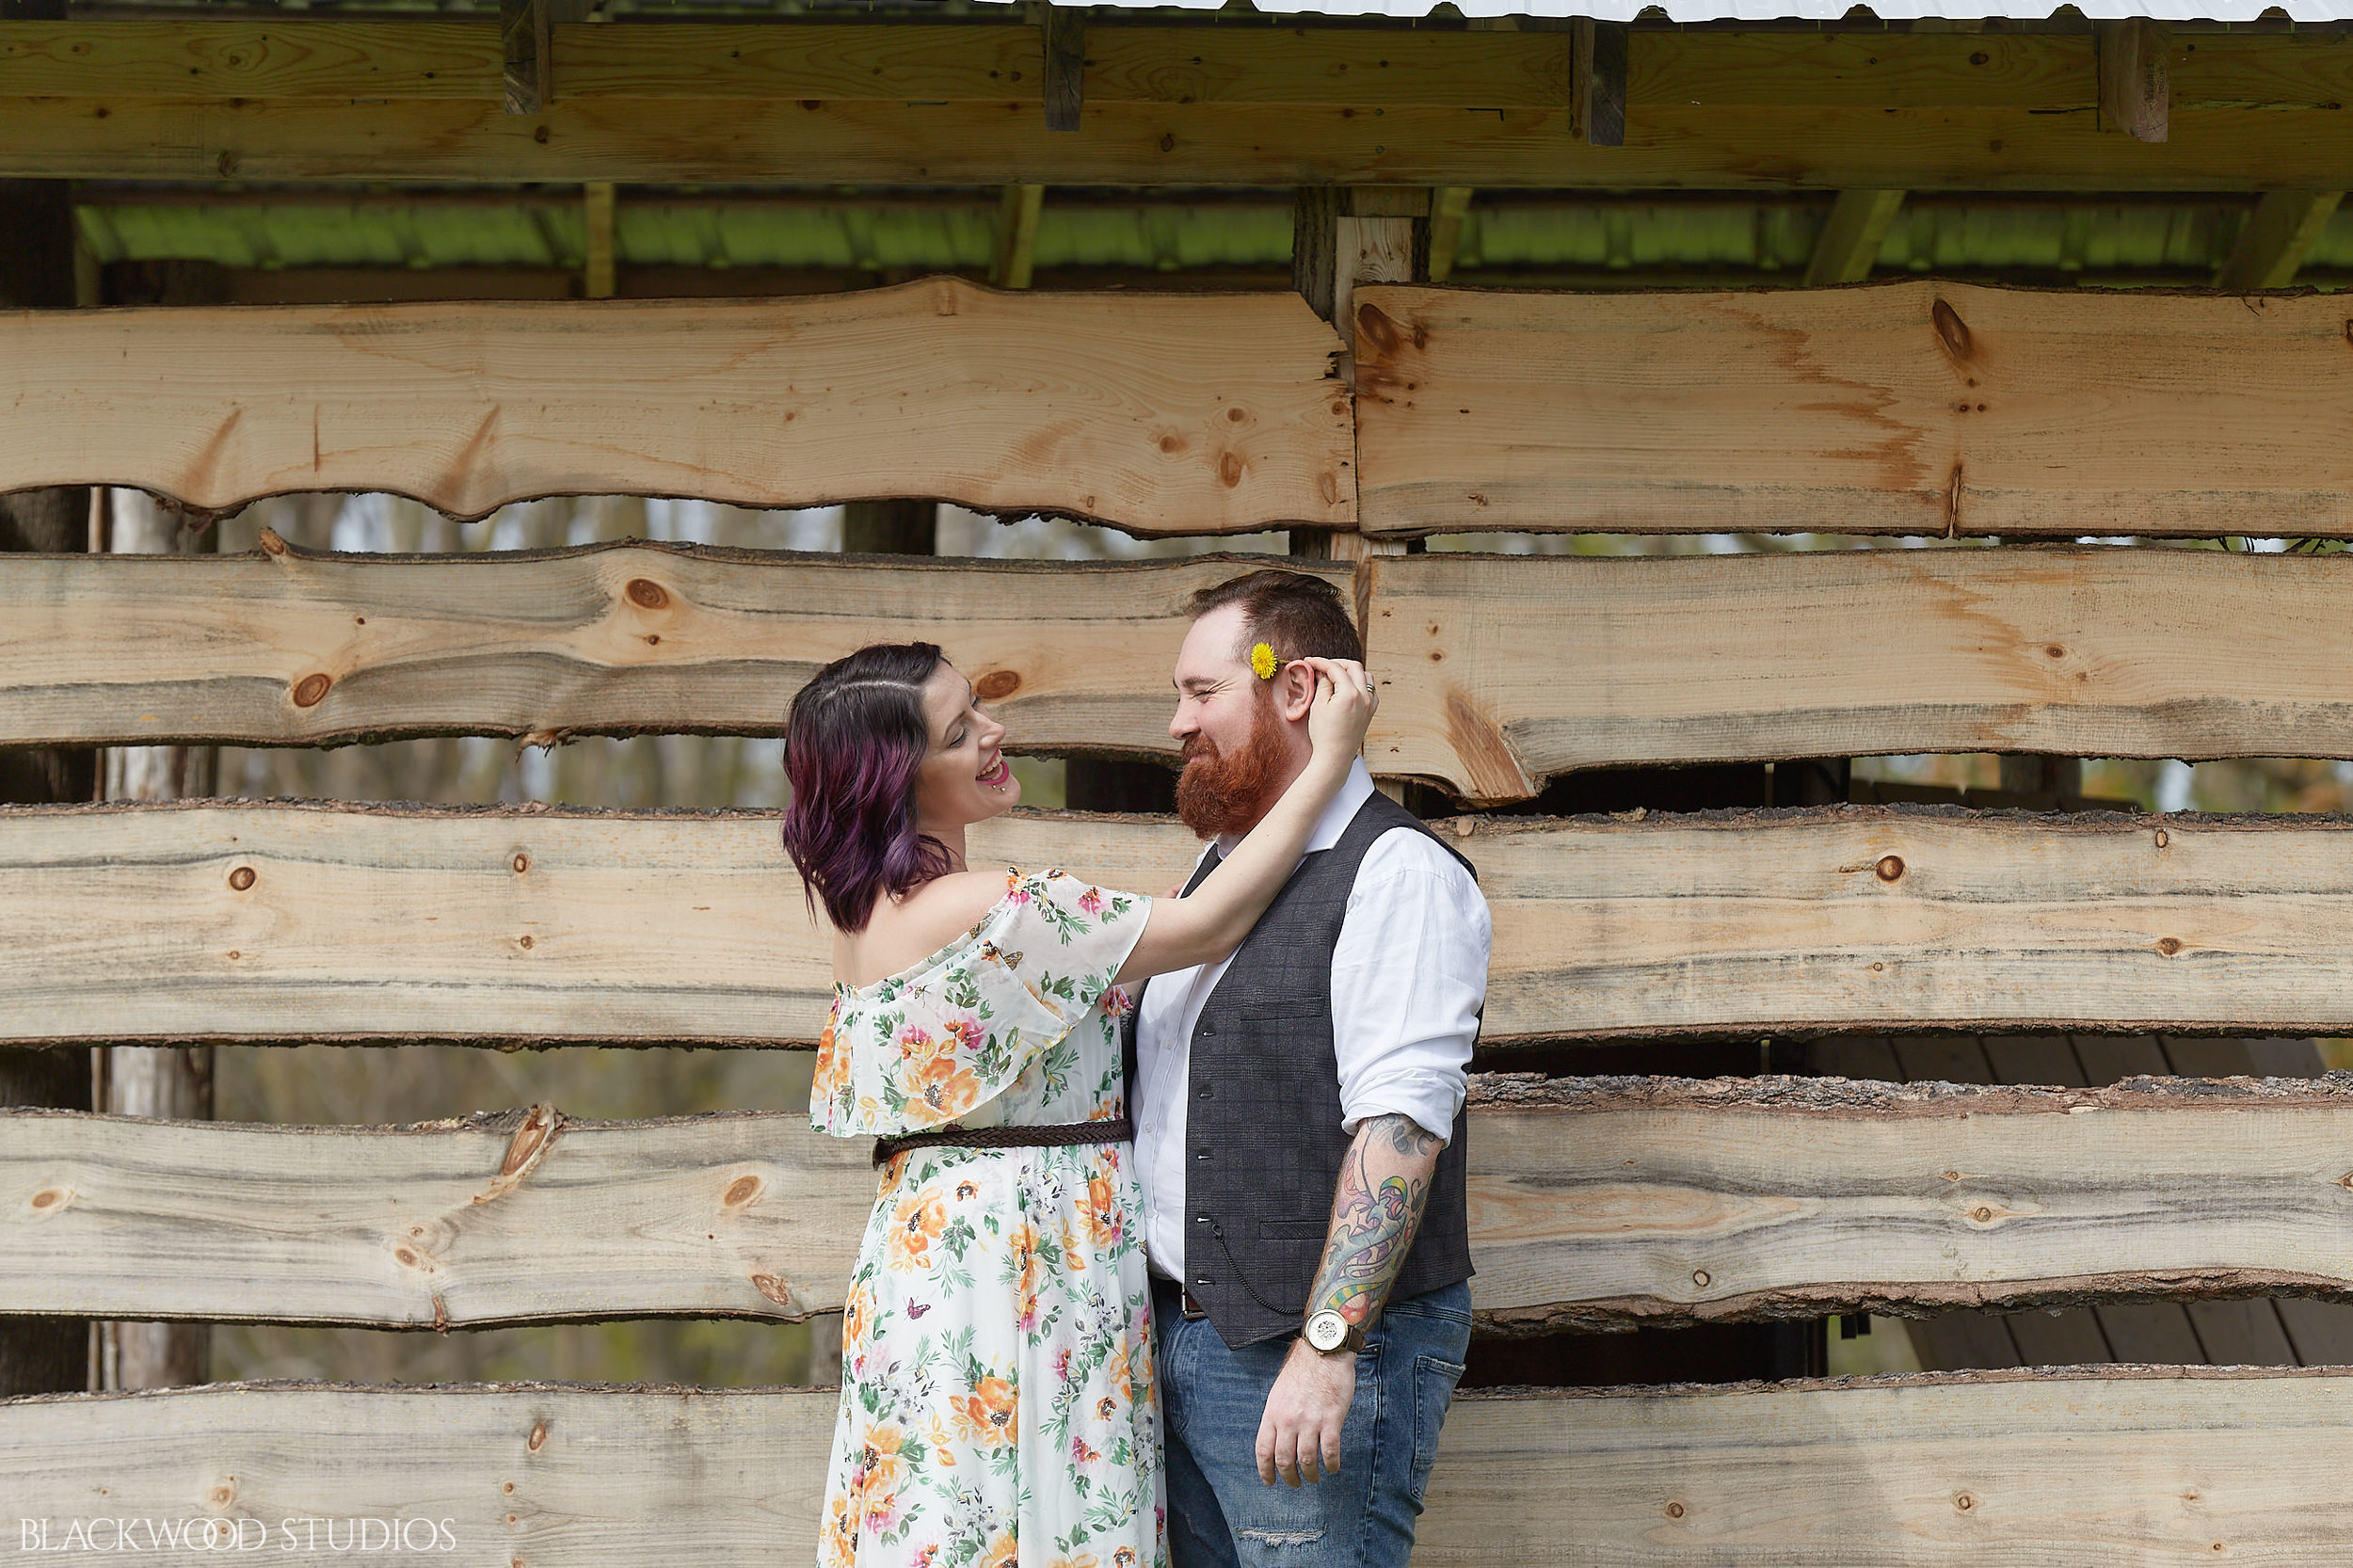 Blackwood-Studios-Photography-20190519163116-David-Kalin-Engagement-Session-Mount-Nemo-Scout-Camp-Burlington-Ontario-Canada.jpg